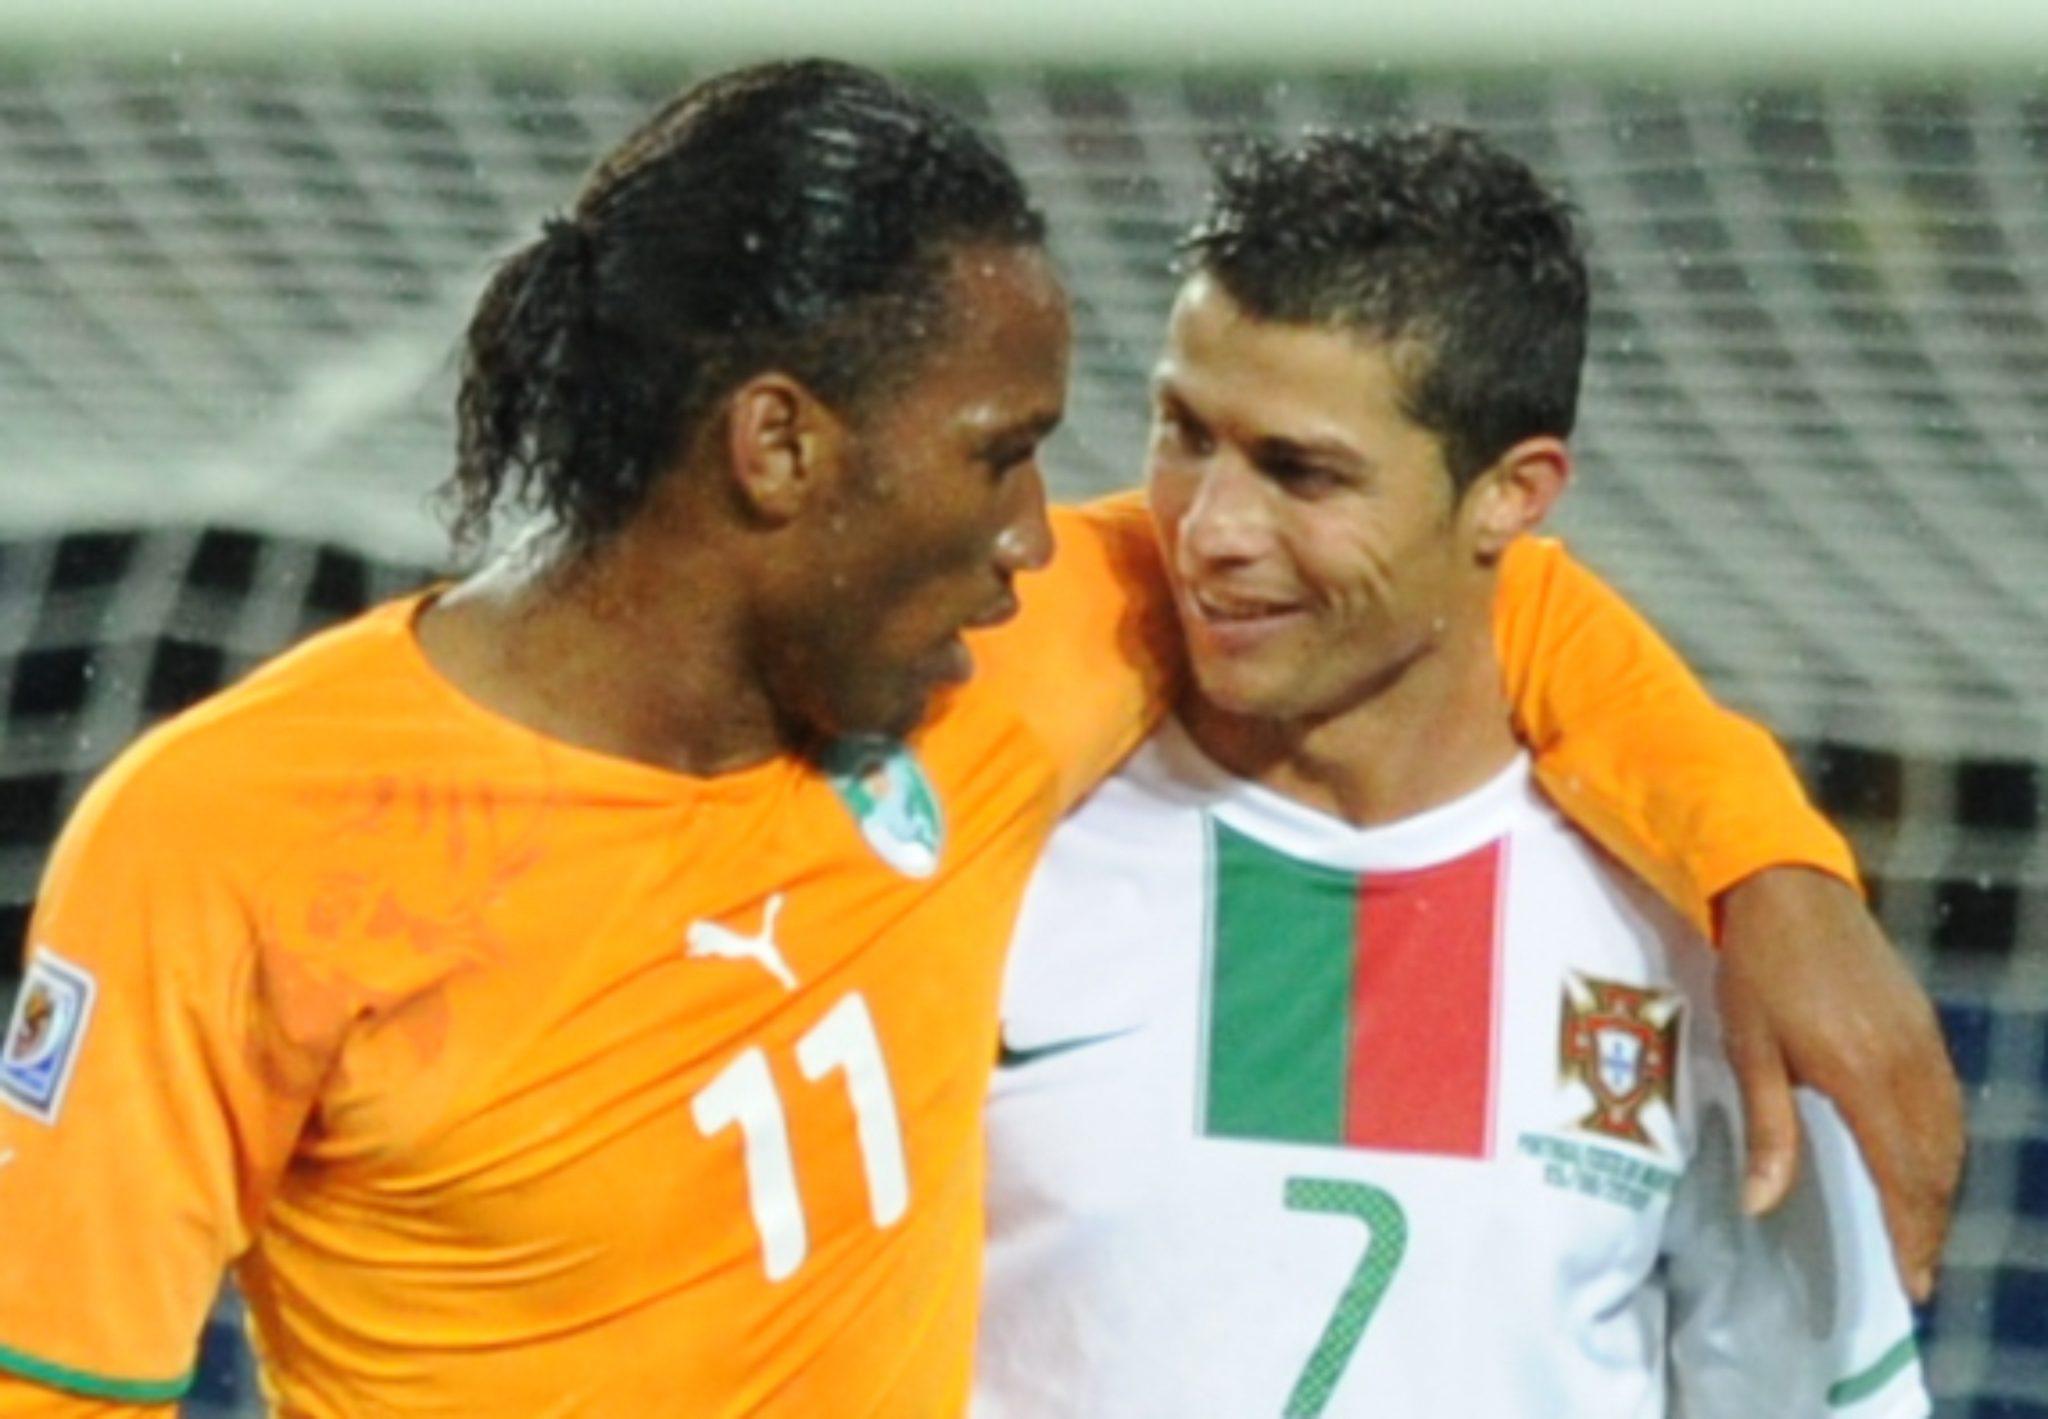 Didier Drogba Amp Ronaldo Dgl Sports Vancouver Sport And